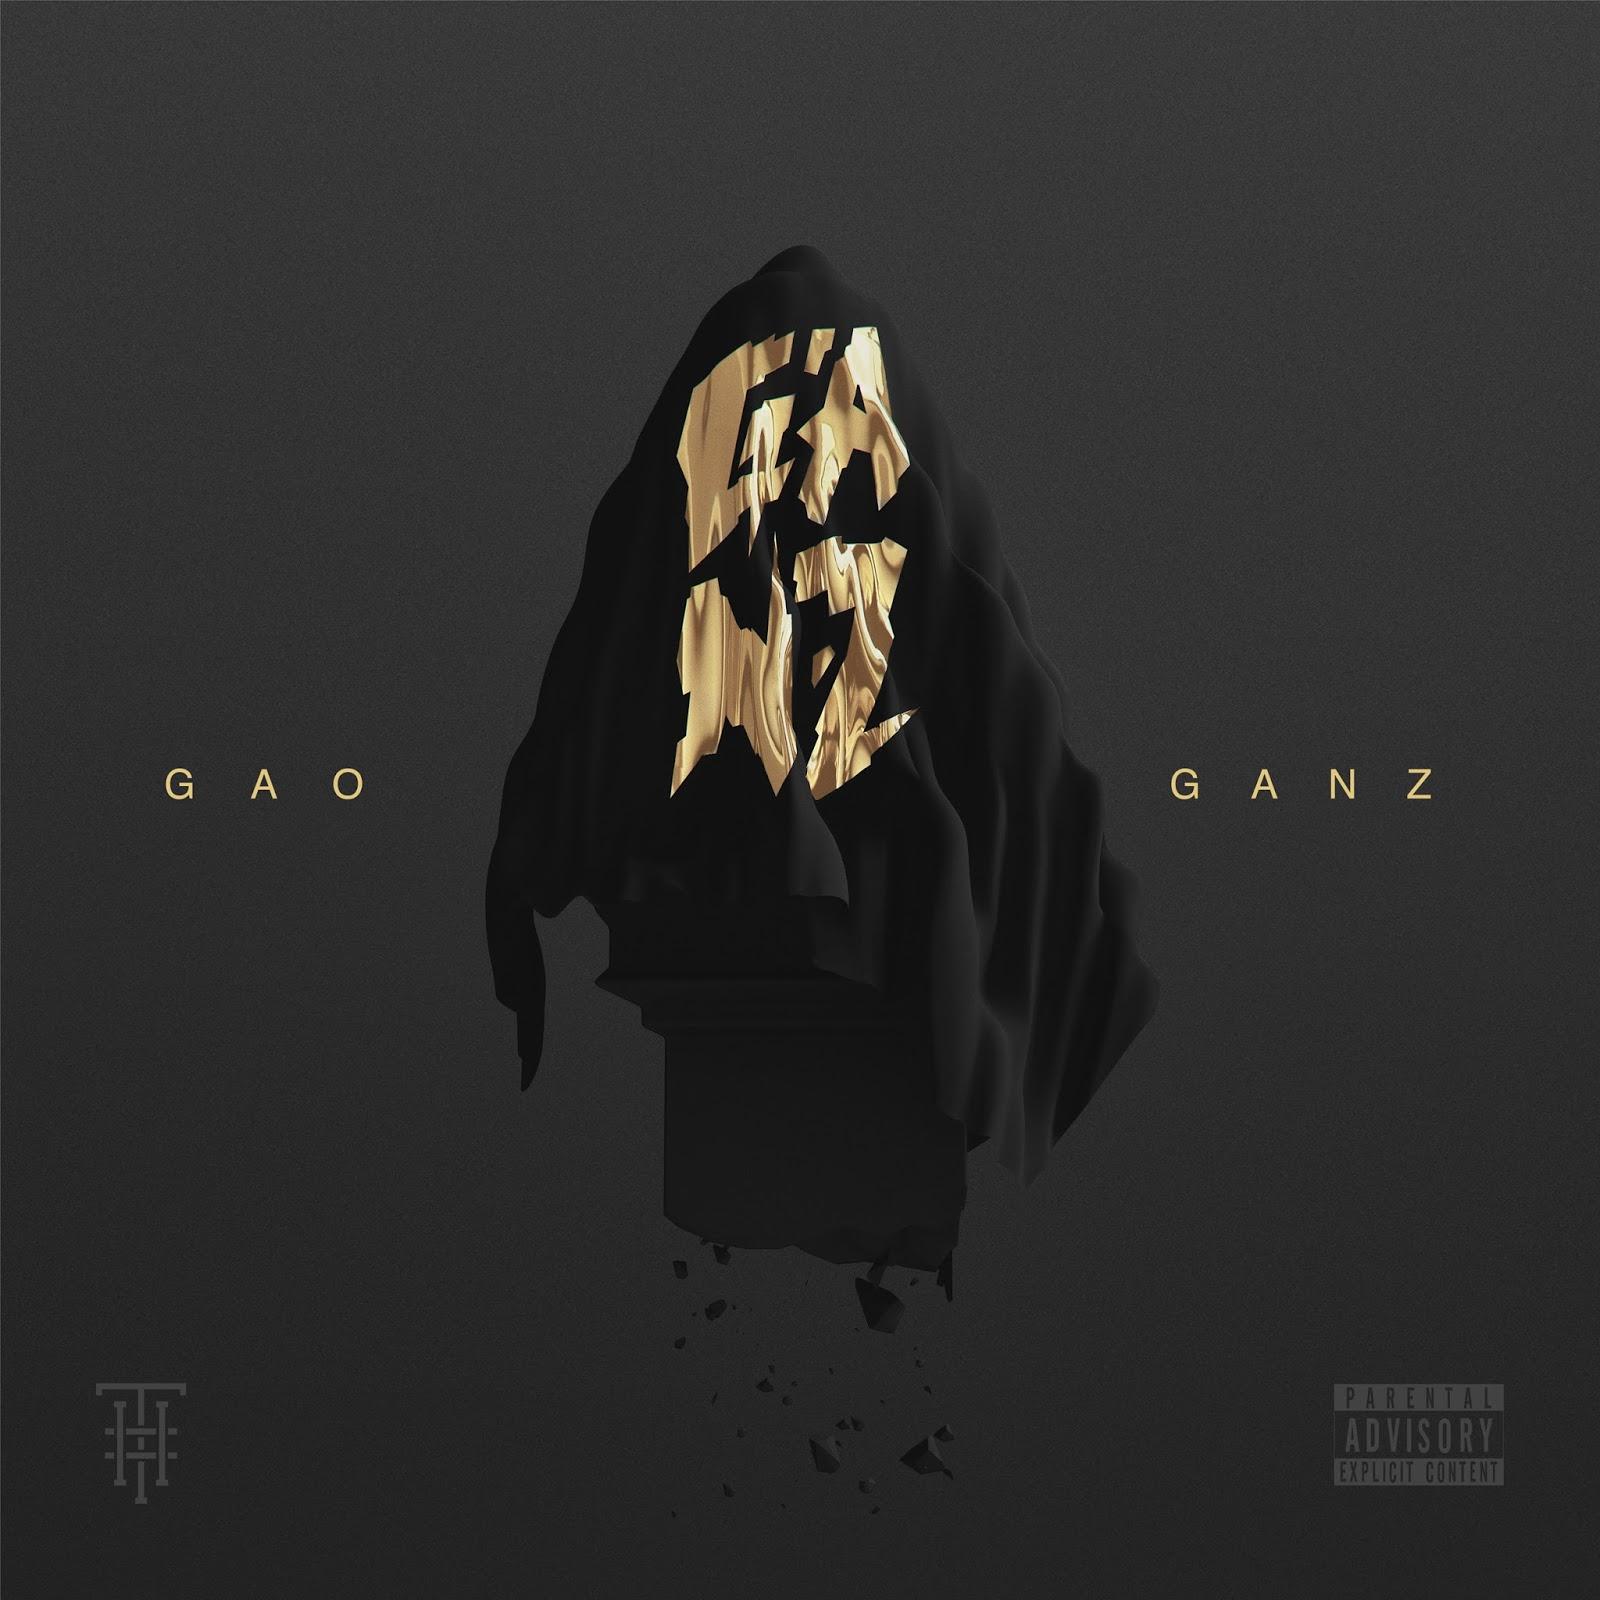 GANZ - GAO - EP Cover